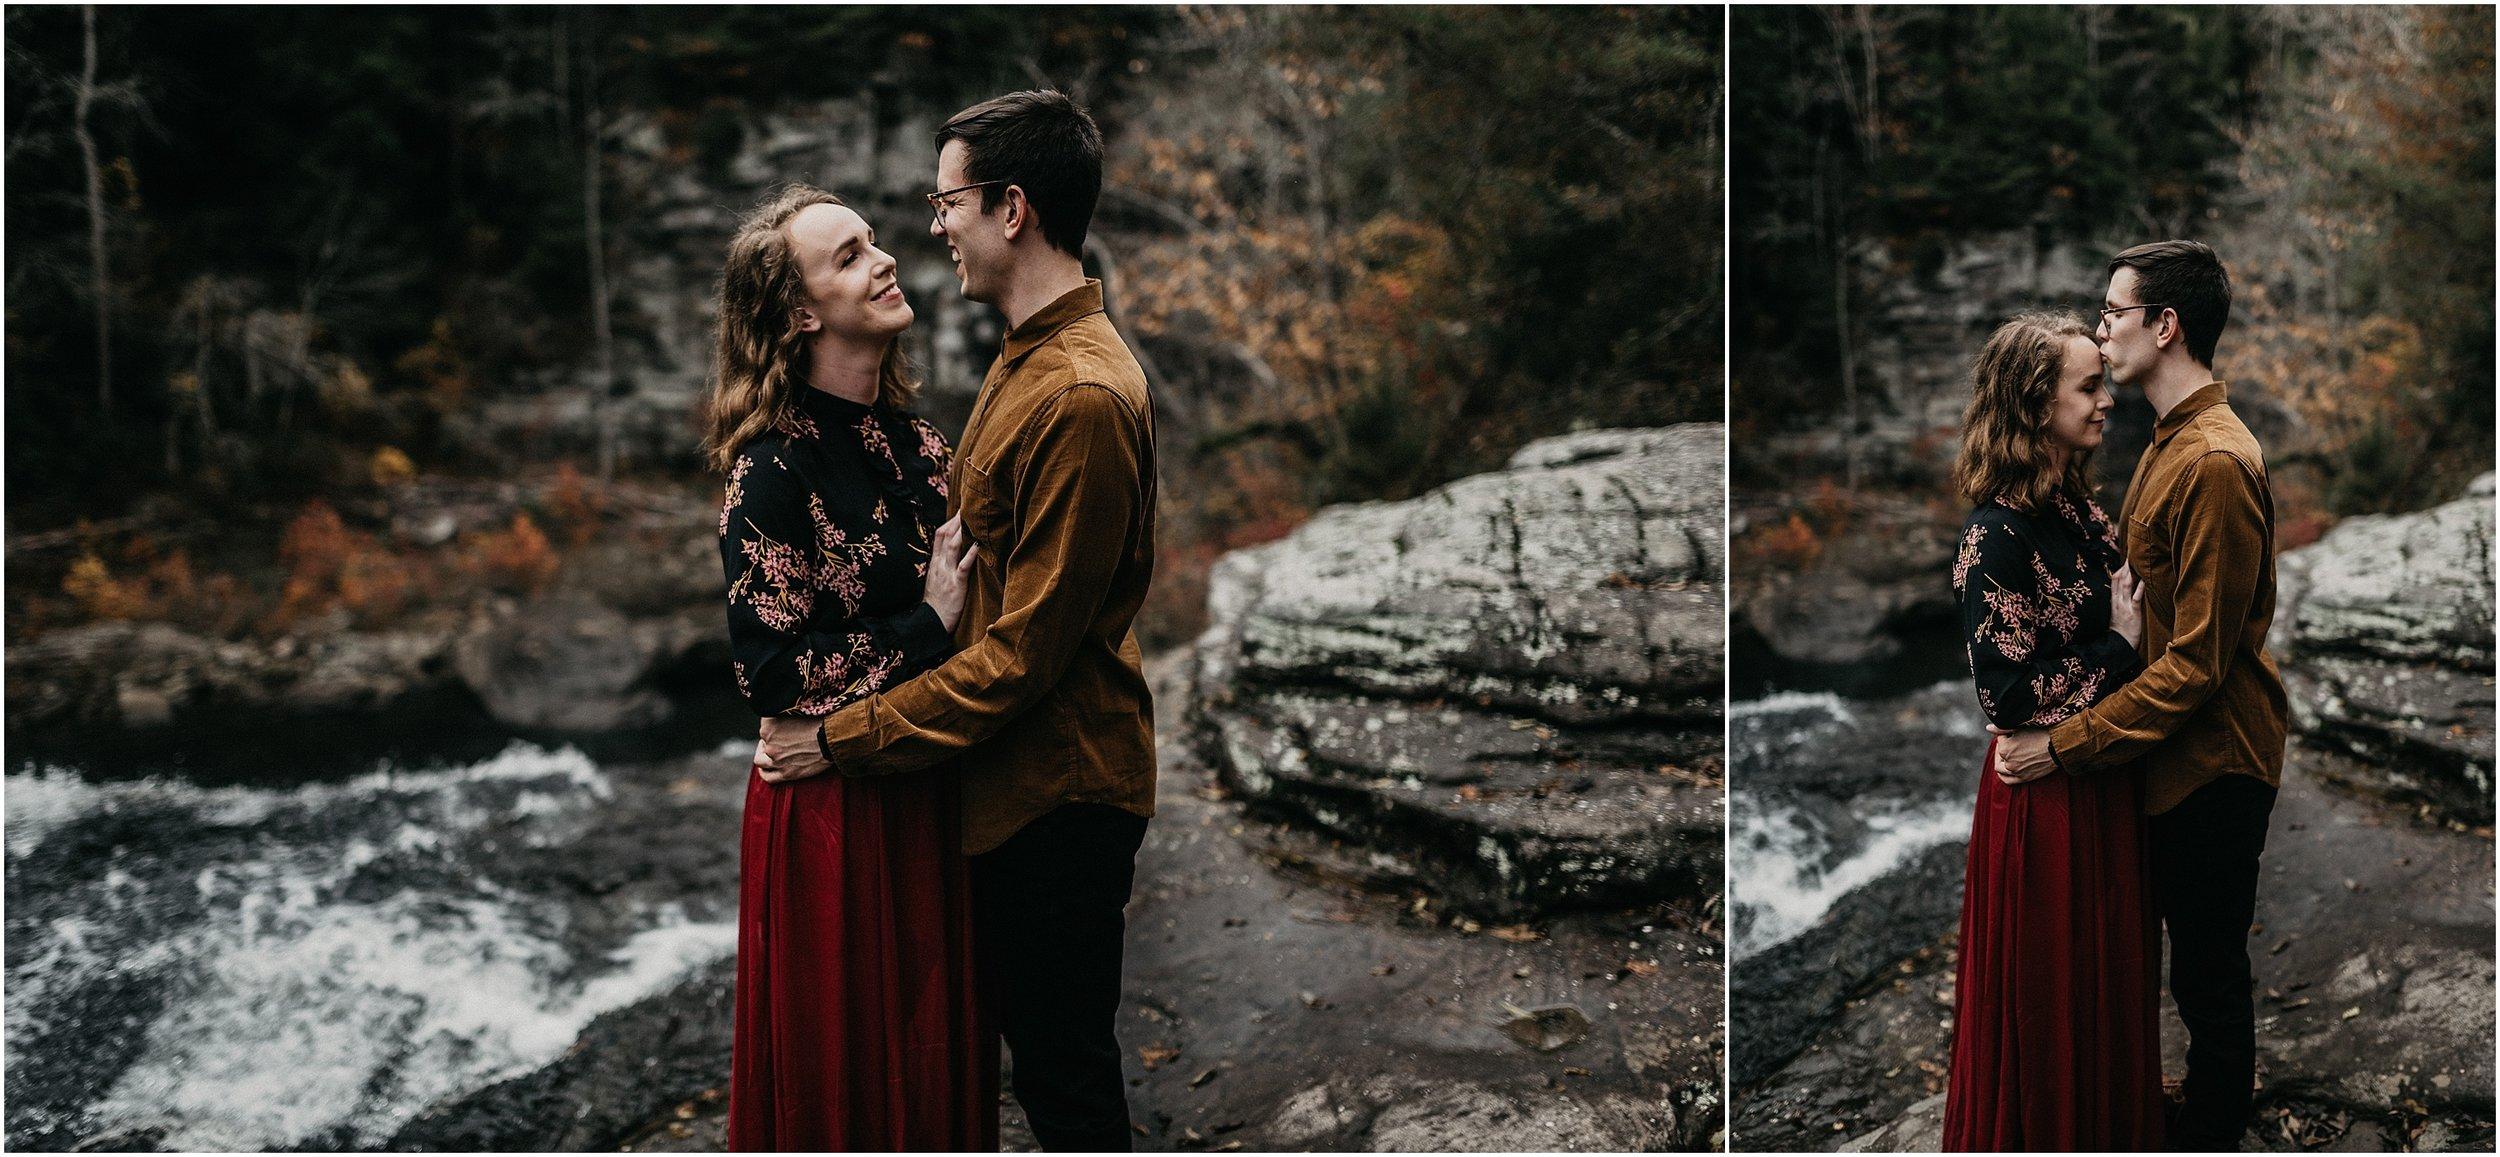 Chattanooga-Autumn-Engagement-05.jpg